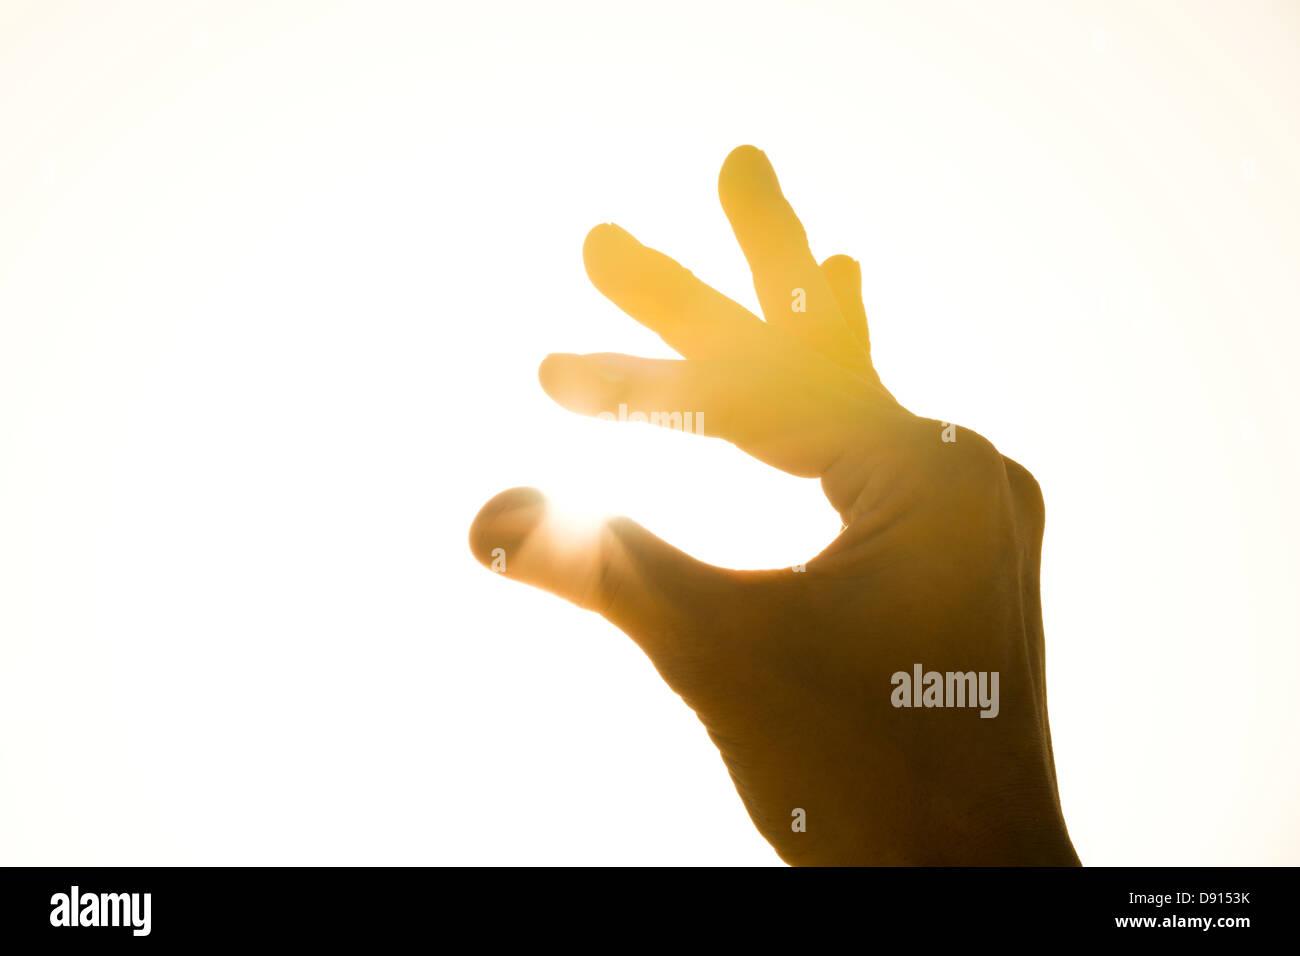 Human hand holding sun - Stock Image